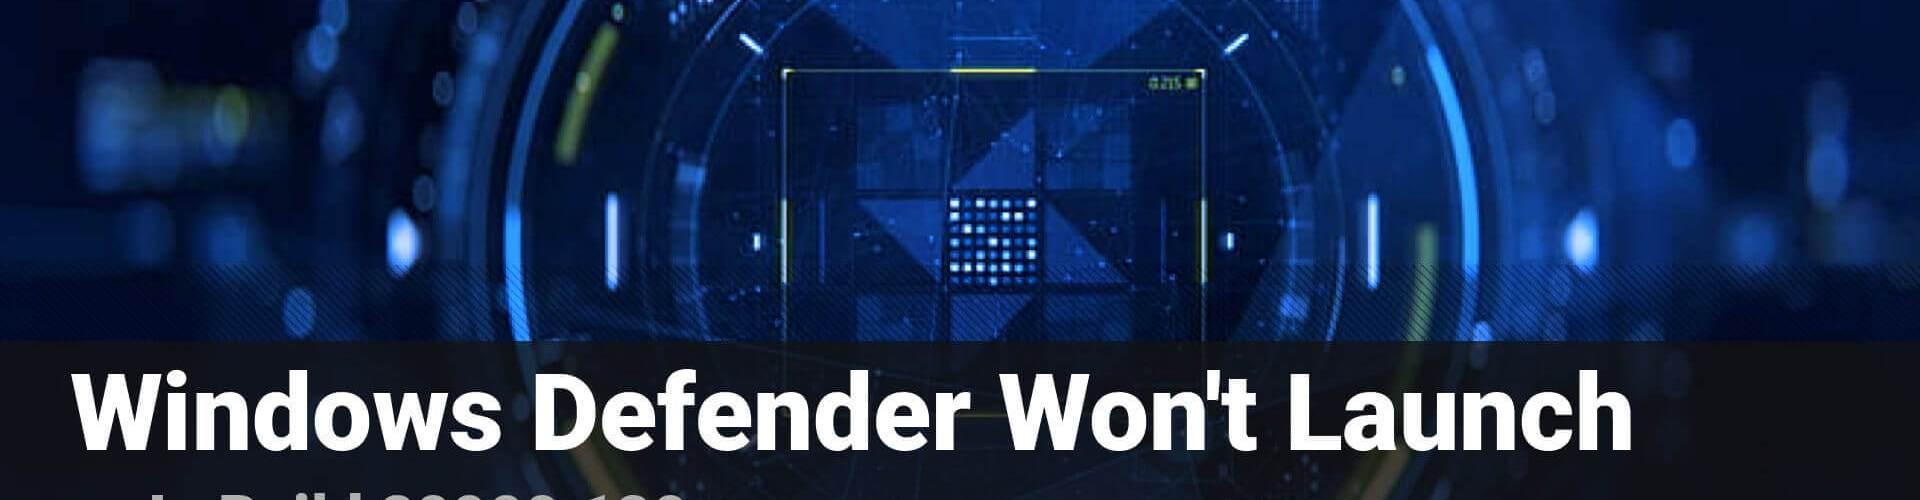 Windows Defender New App Error